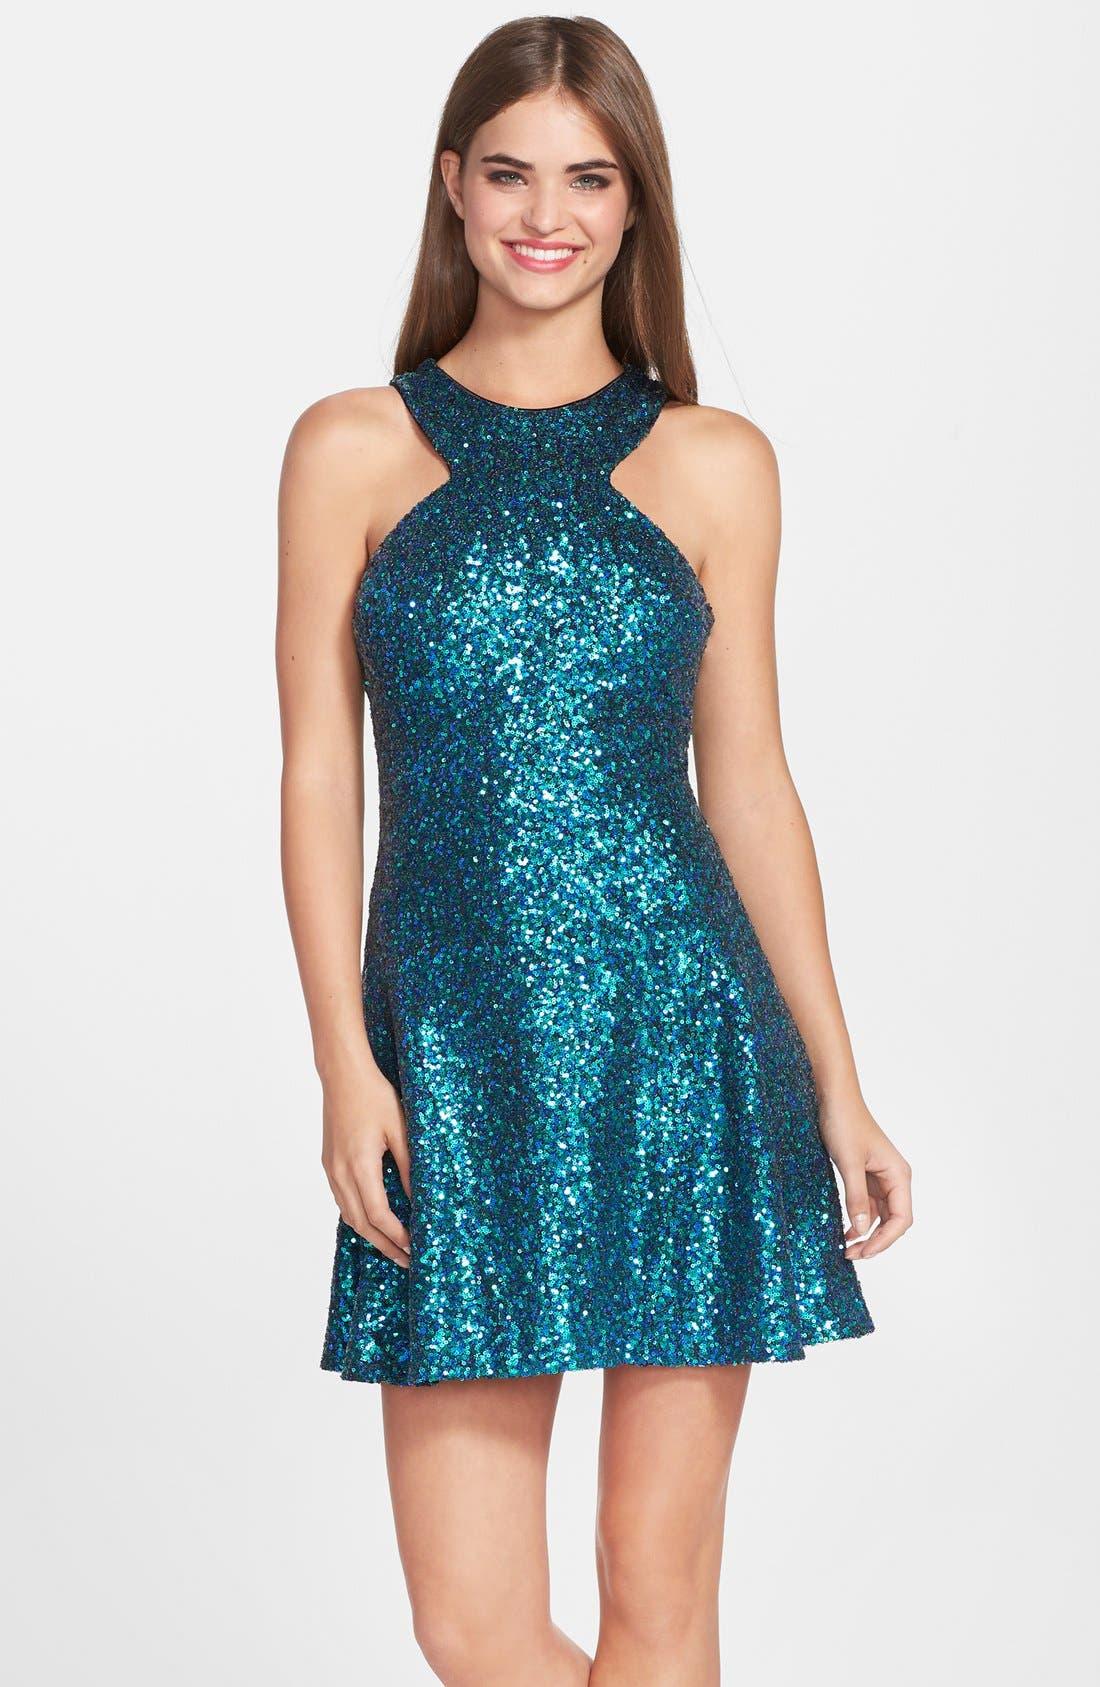 Alternate Image 1 Selected - Dress the Population 'Helene' Sequin Fit & Flare Dress